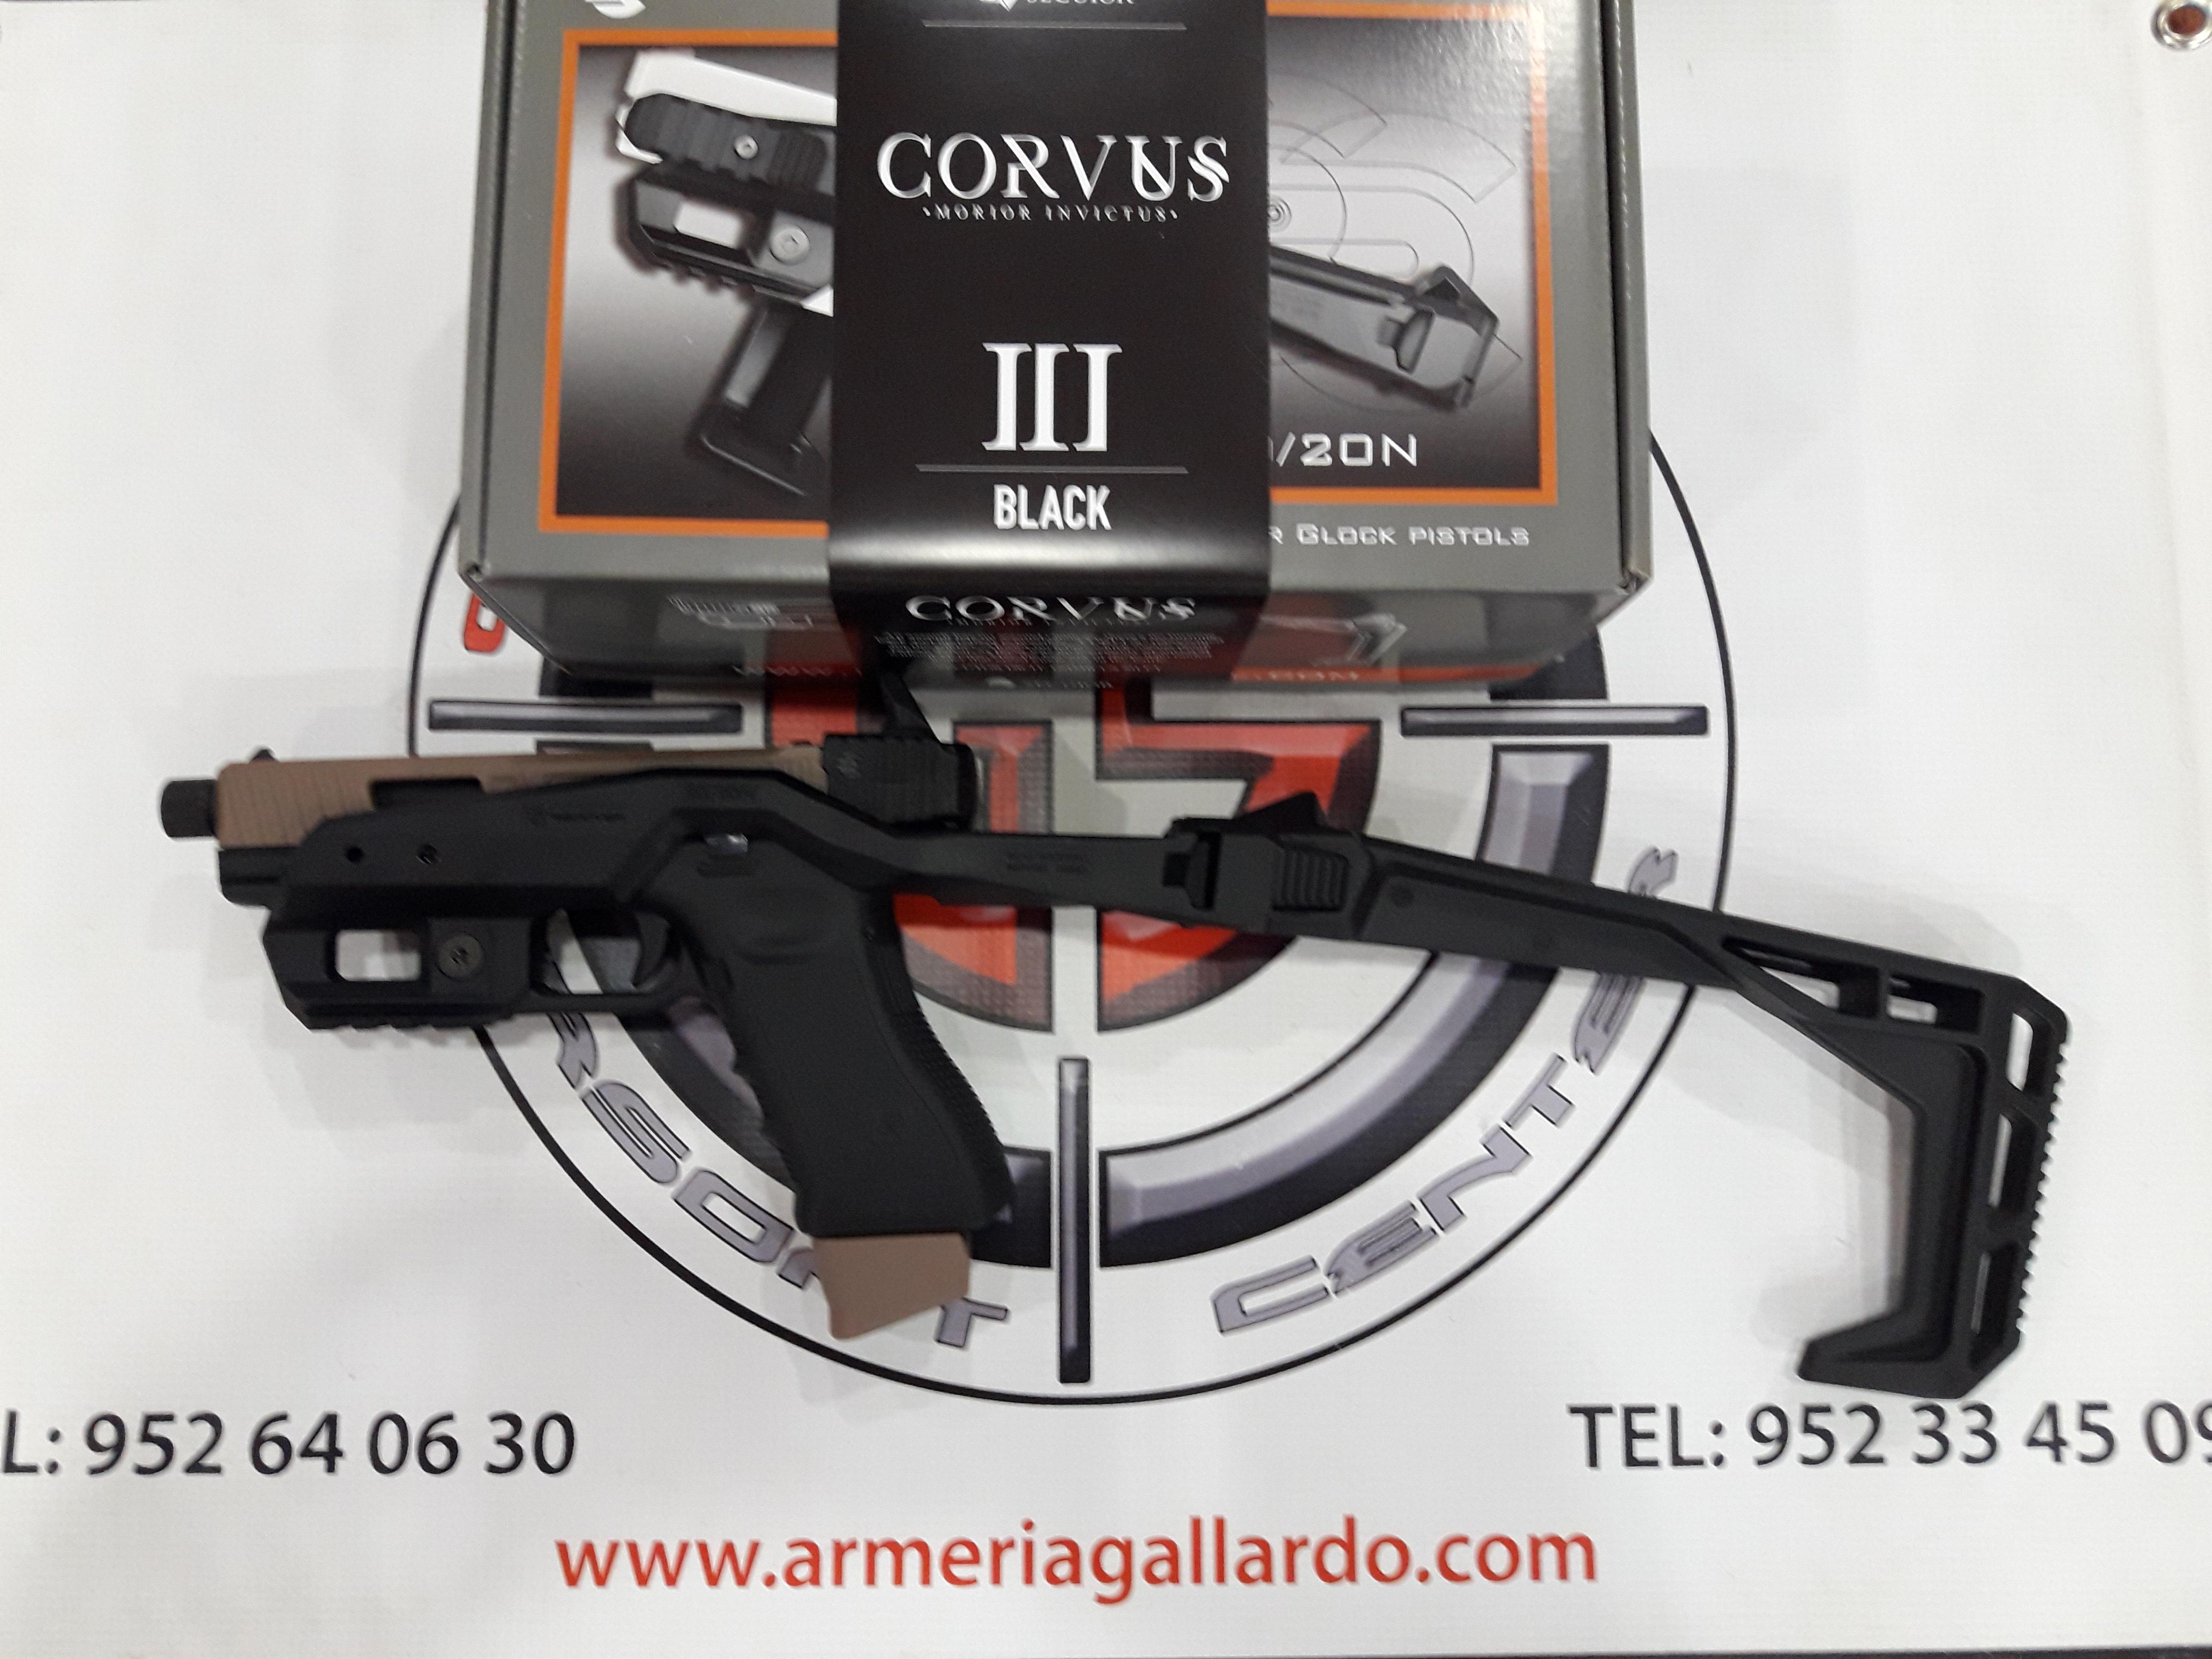 CORVUS III BLACK SECUTOR ARMS